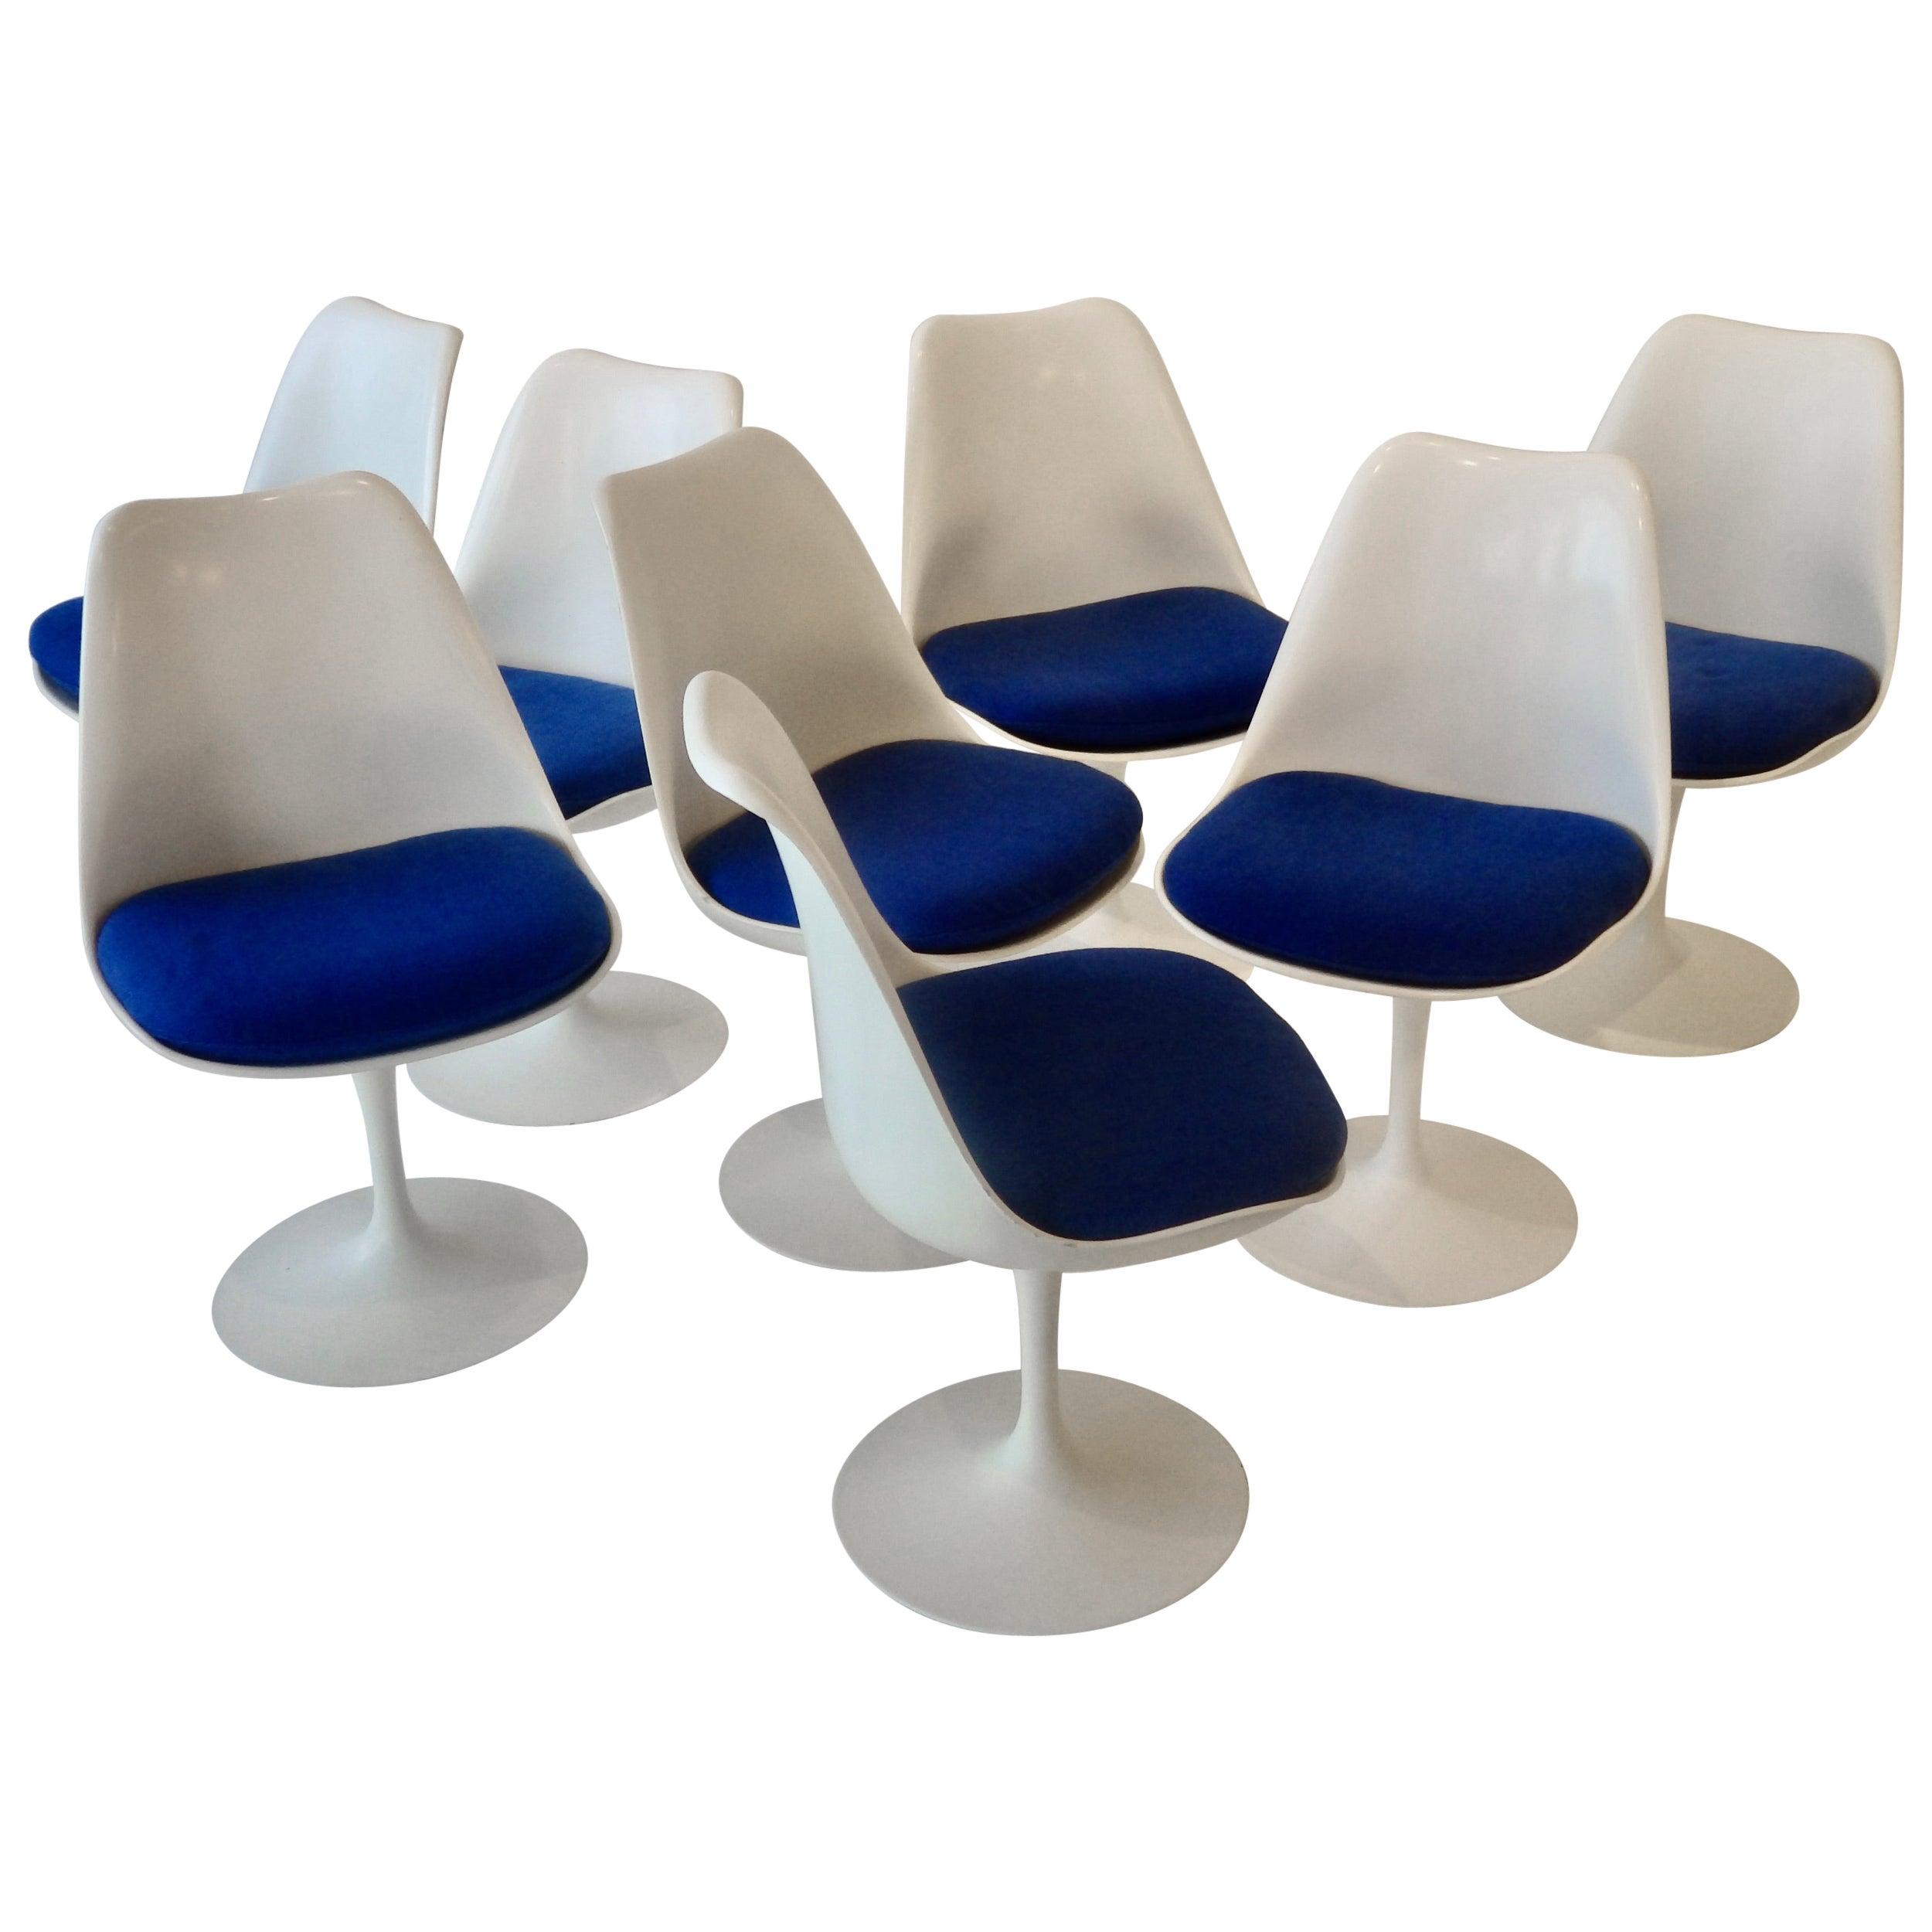 Eight Eero Saarinen for Knoll Tulip Group White Swivel Dining Chairs